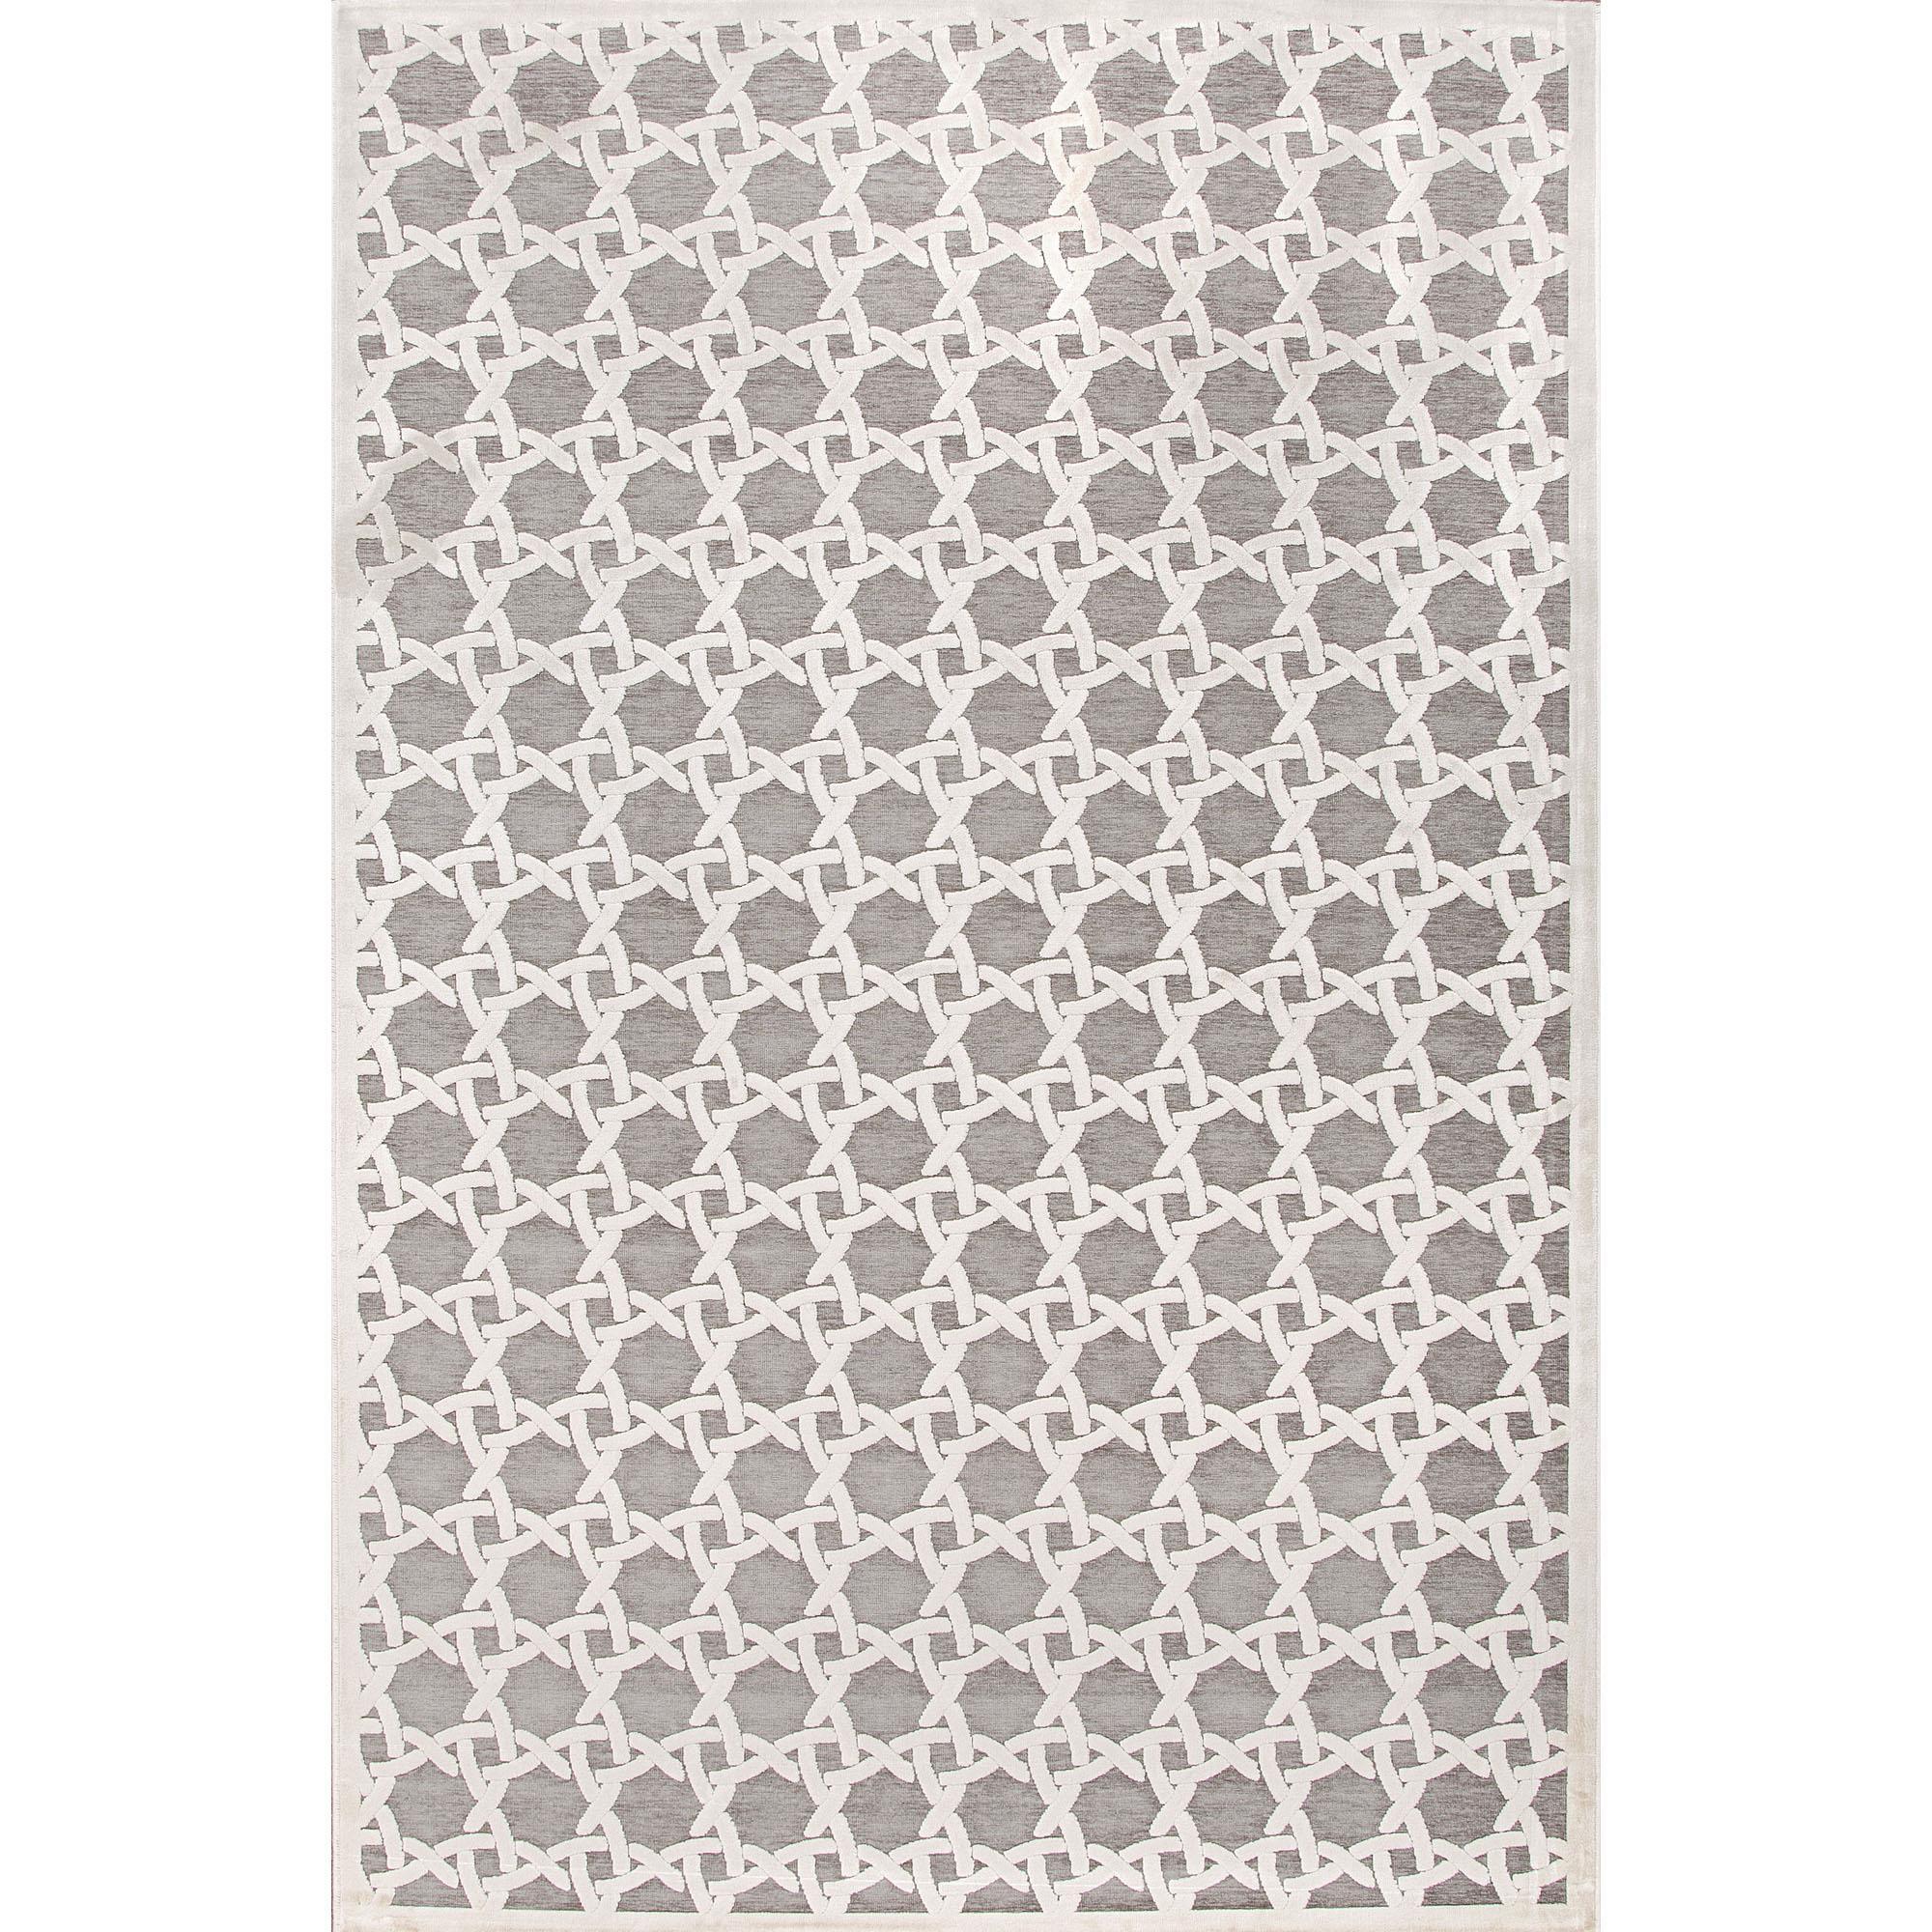 JAIPUR Rugs Fables 7.6 x 9.6 Rug - Item Number: RUG111965